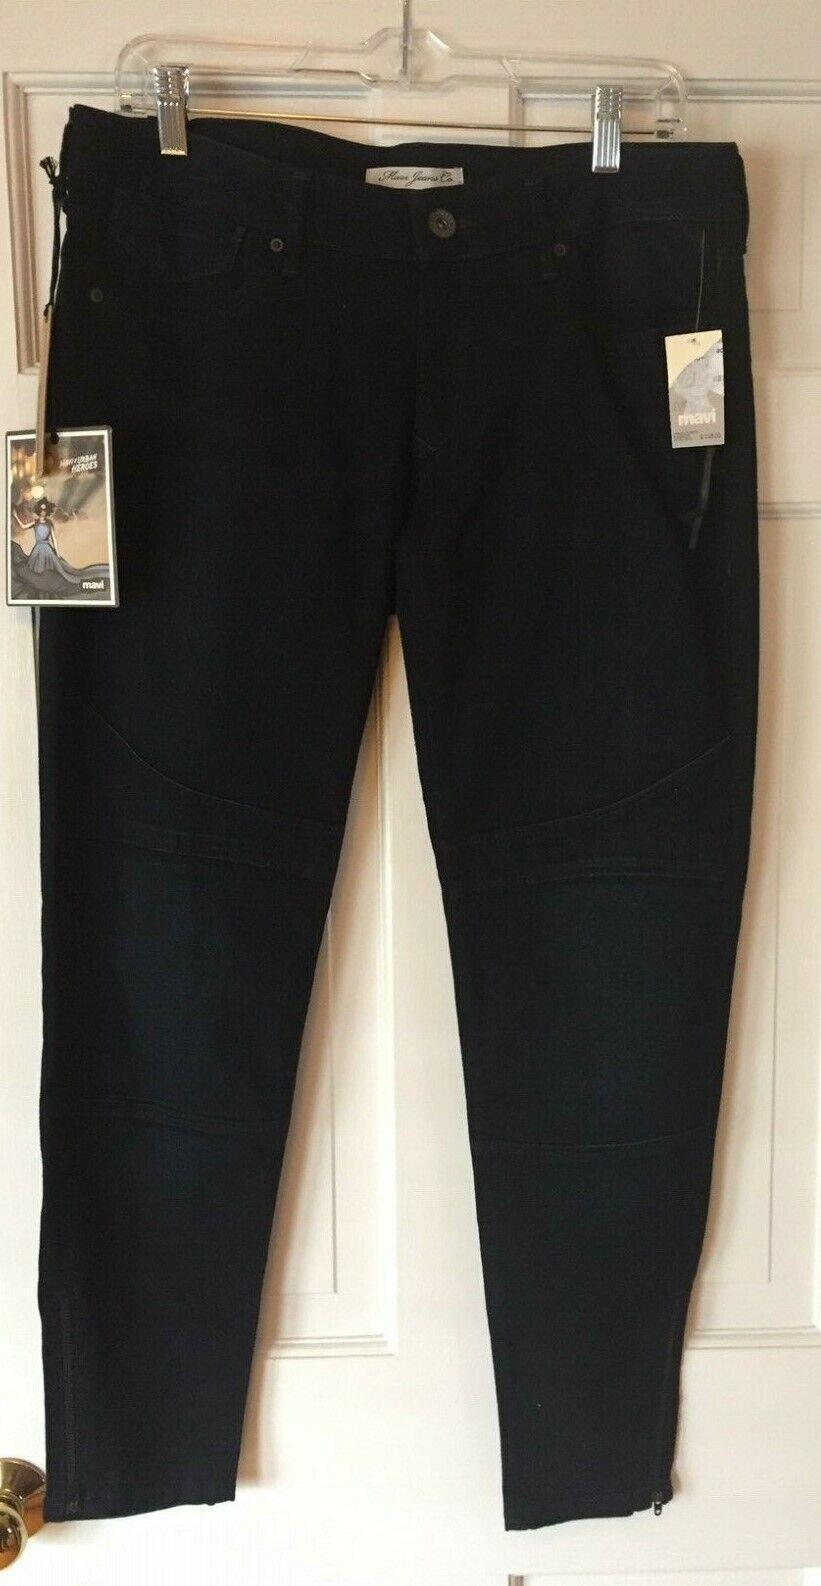 NEW MAVI Turkey Designer Ankle Zip Skinny Stretch Jeans Front Seam Detail 32